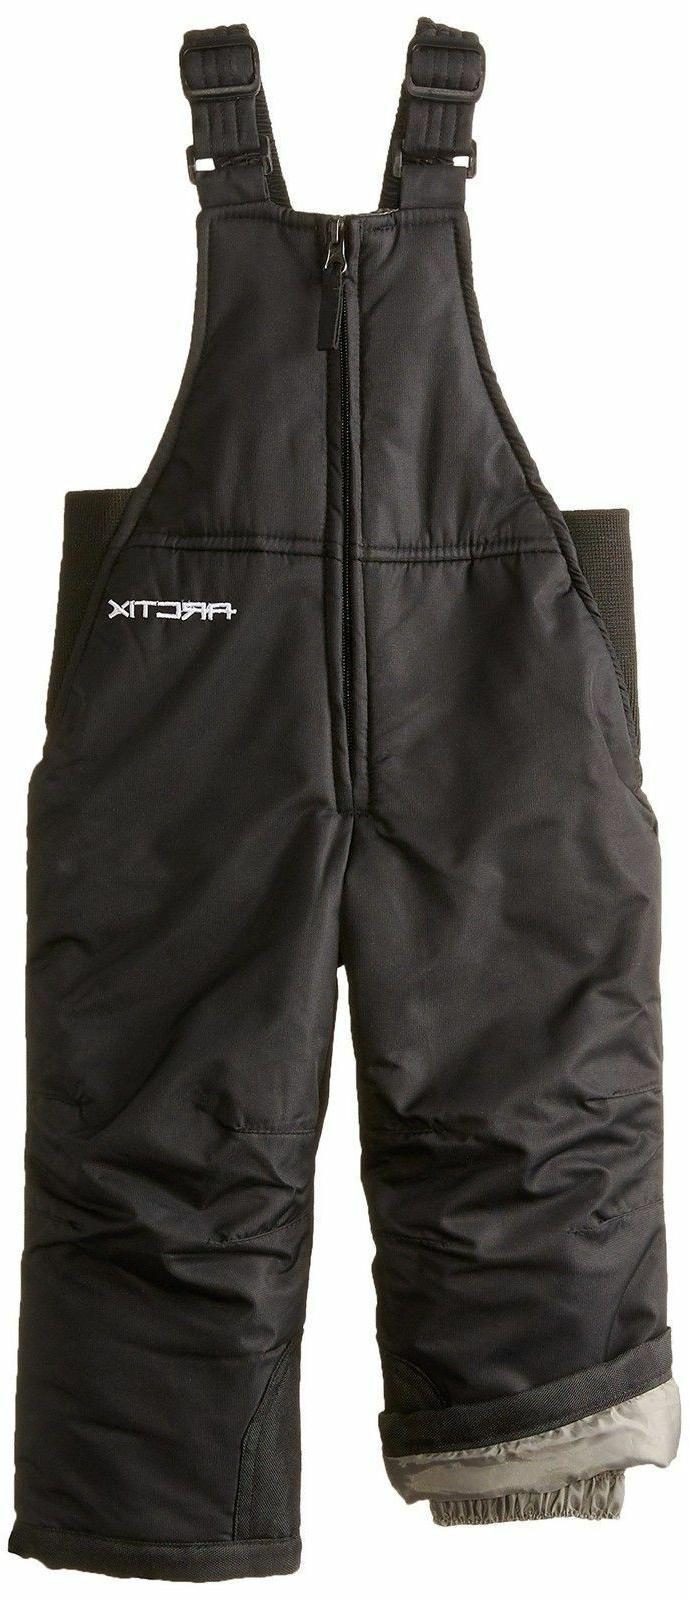 Arctix Infant/Toddler Insulated Snow Bib Overalls,Black,4T